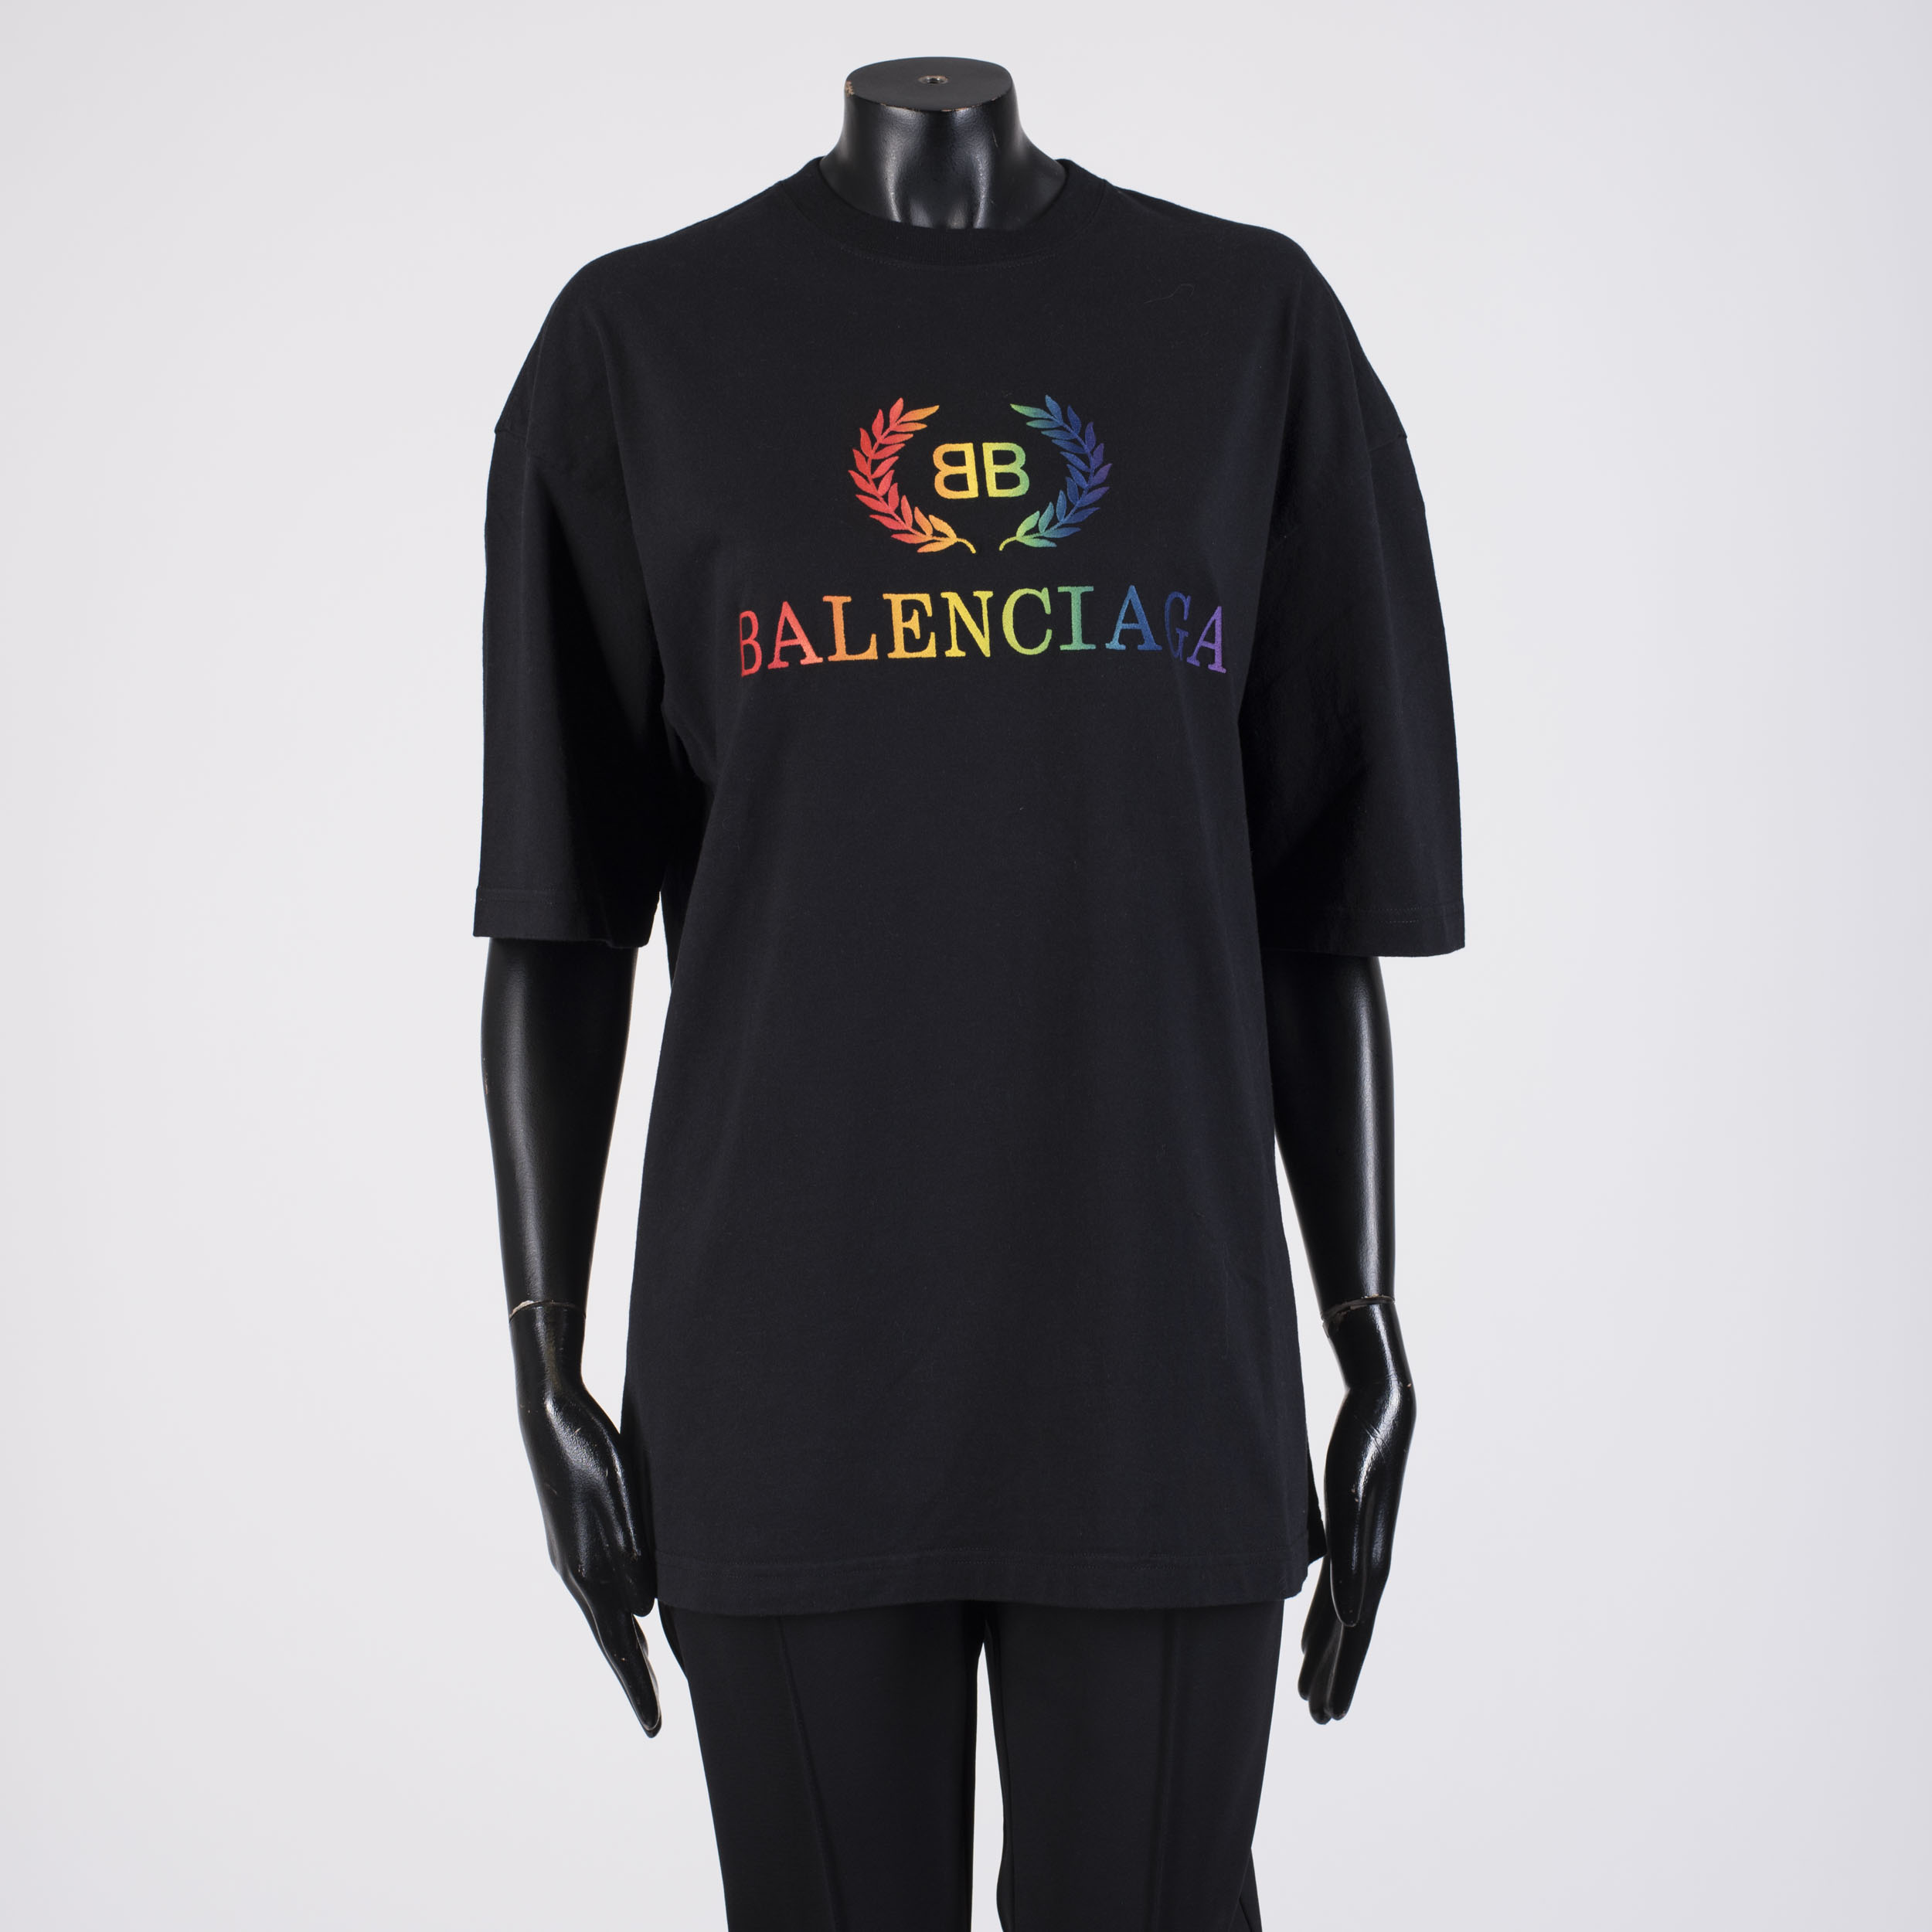 0d85f6f90f4 BALENCIAGA 550$ Oversize Women's Rainbow BB Logo Embroidery T-shirt ...